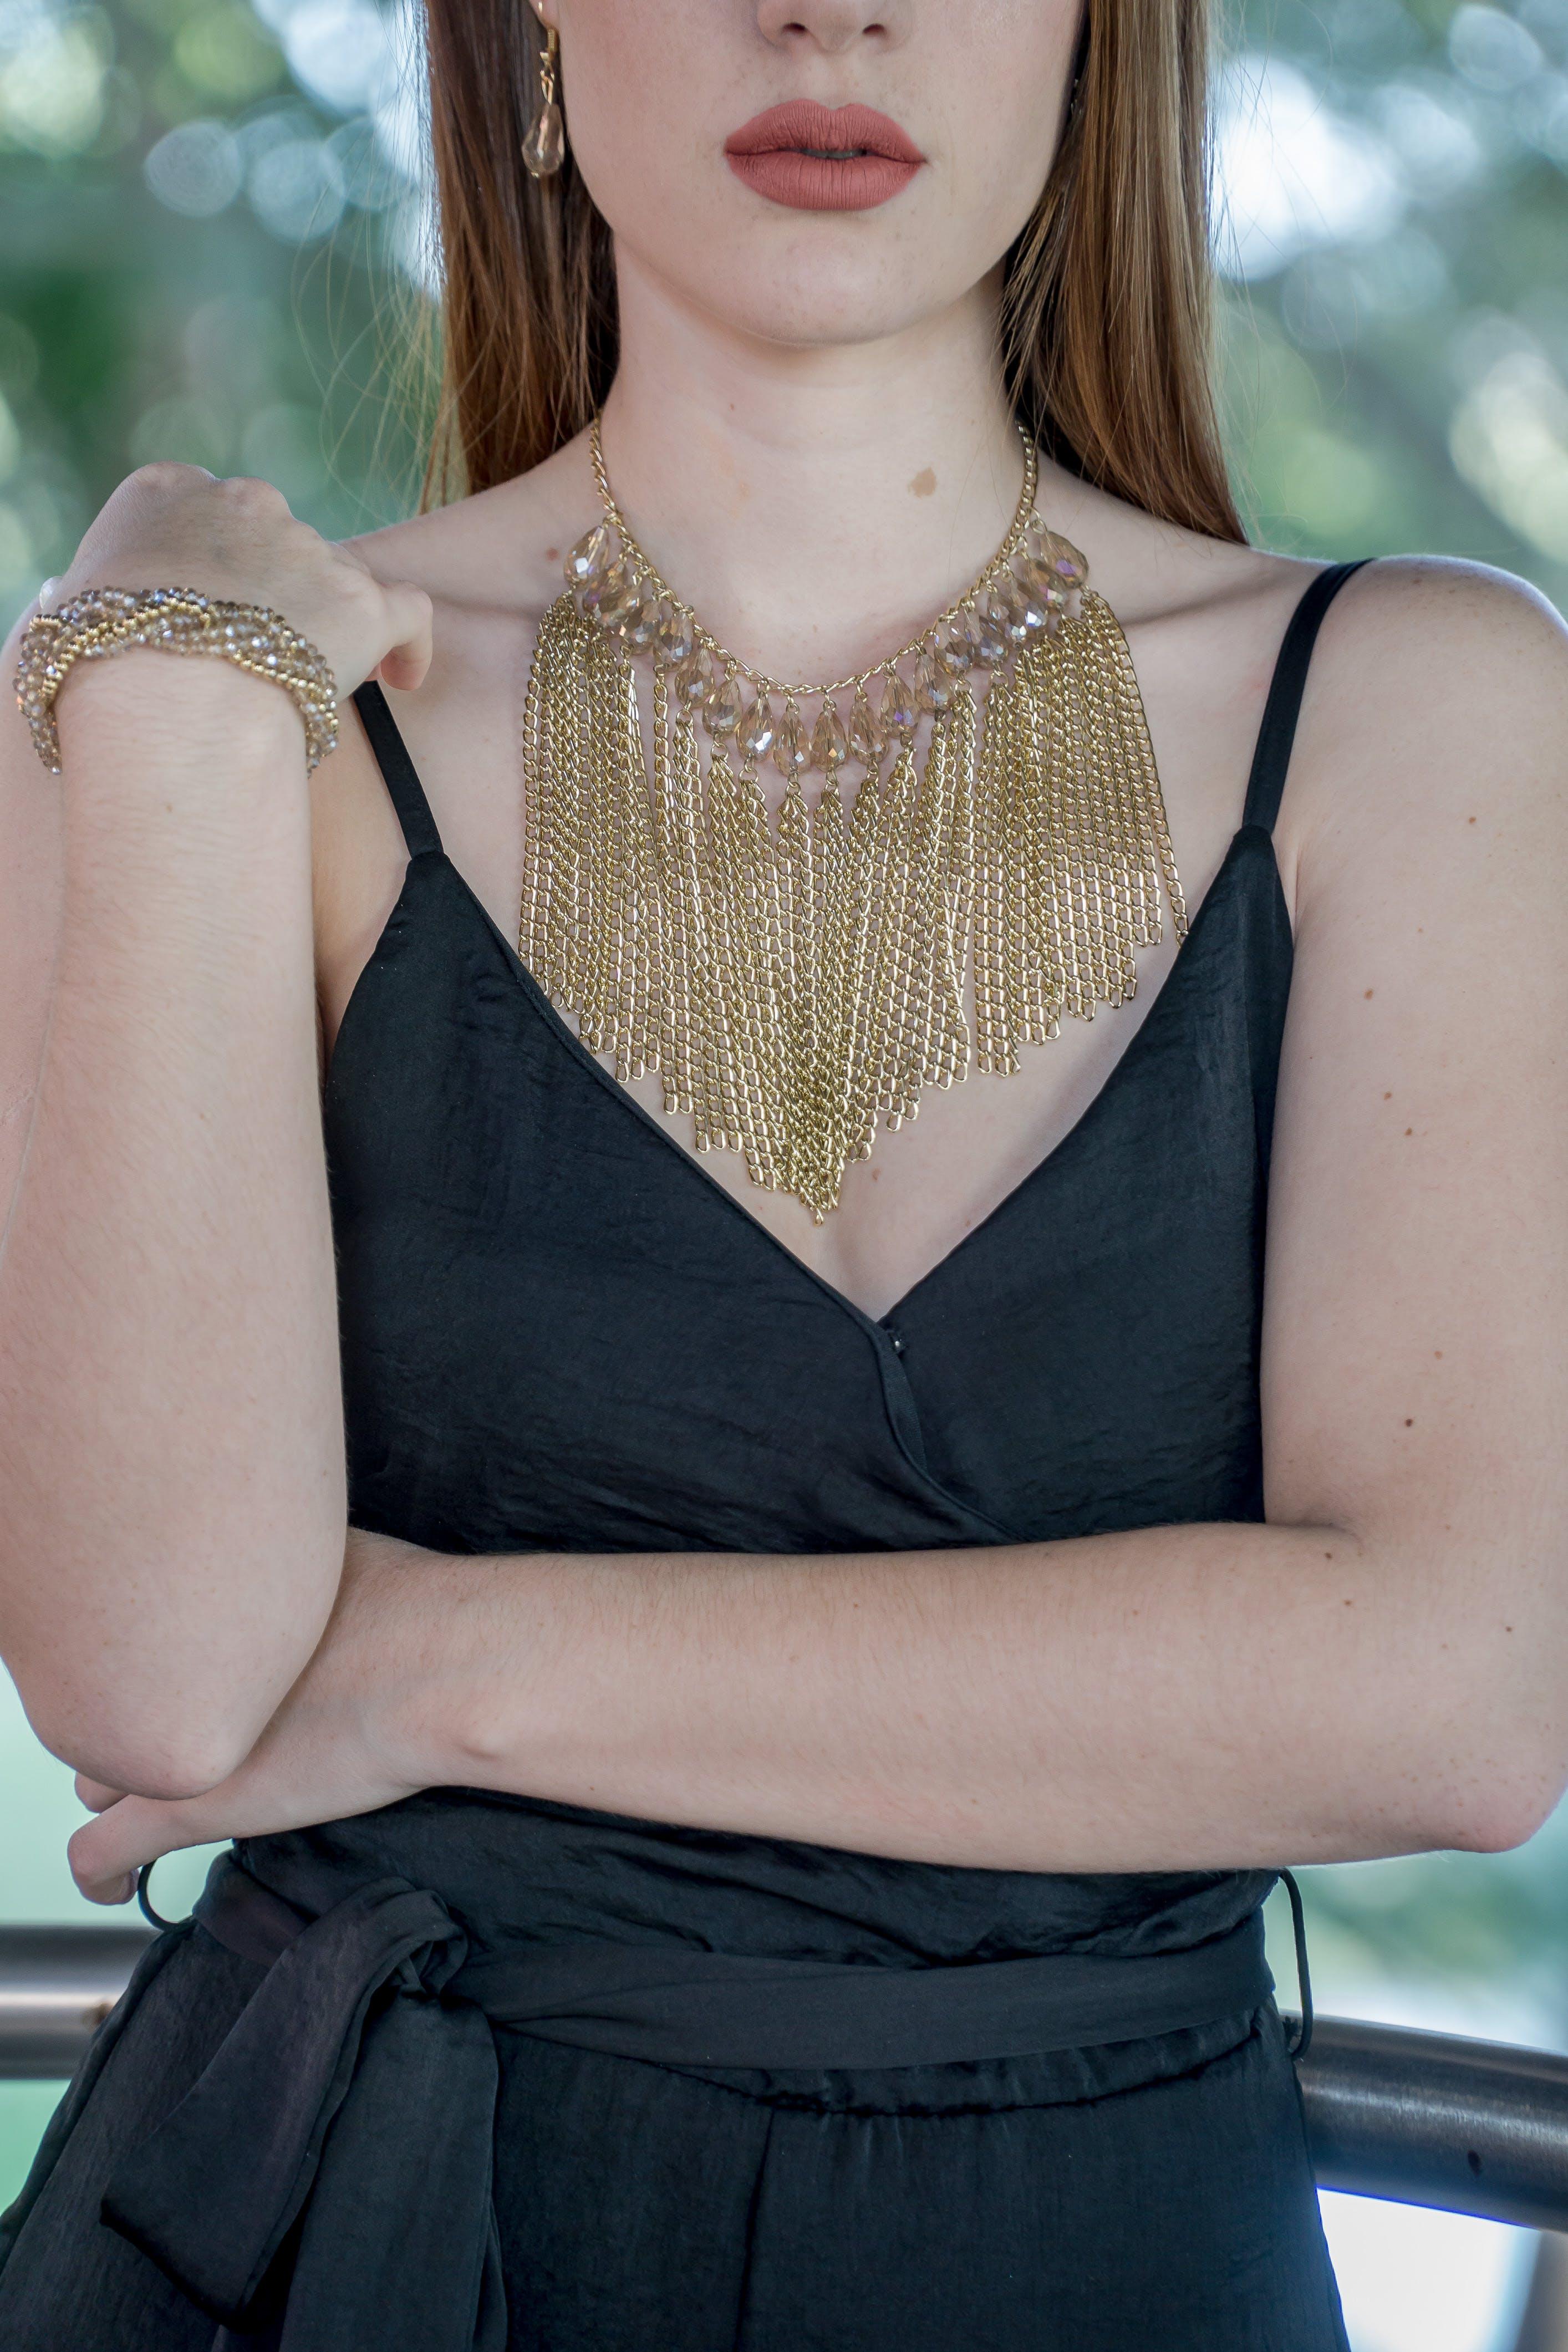 Woman Wearing Gold Chain Bib Necklace